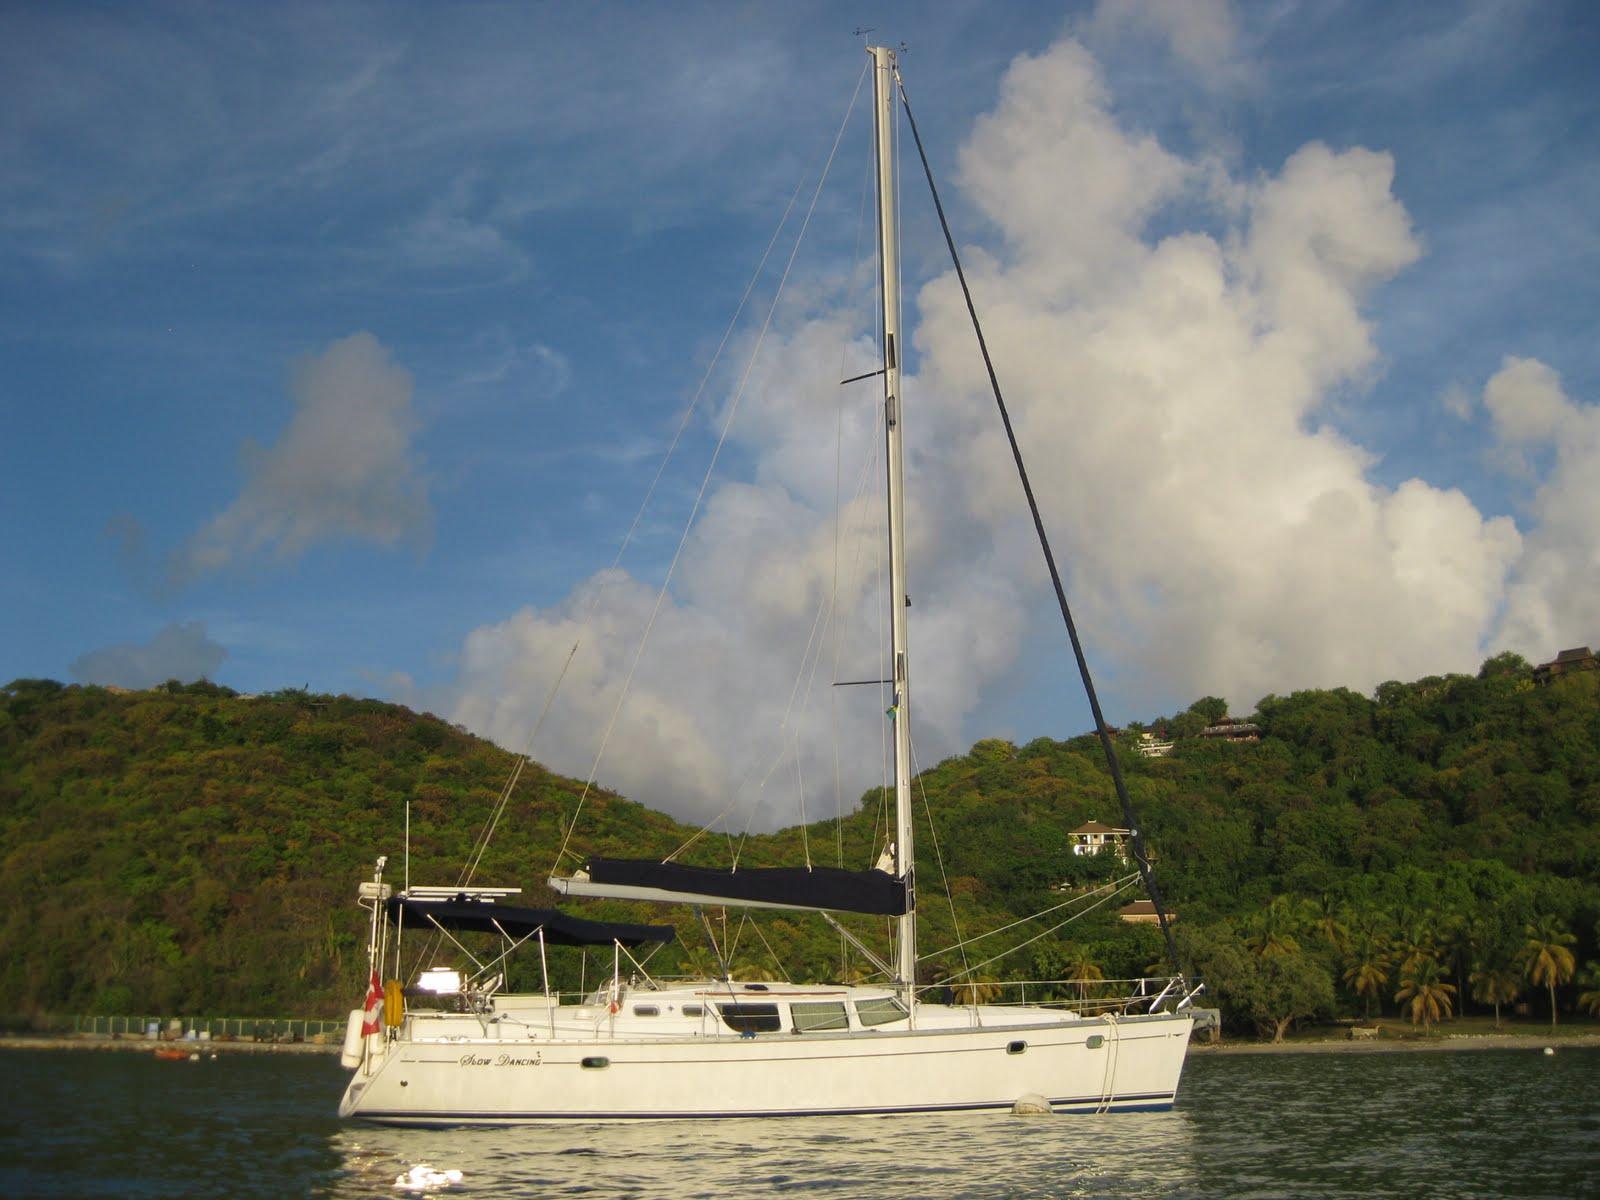 http://2.bp.blogspot.com/_Du9122mirGE/SwVVoH-6csI/AAAAAAAAALI/iA6mR_cGB7o/s1600/Grenadines+250.jpg